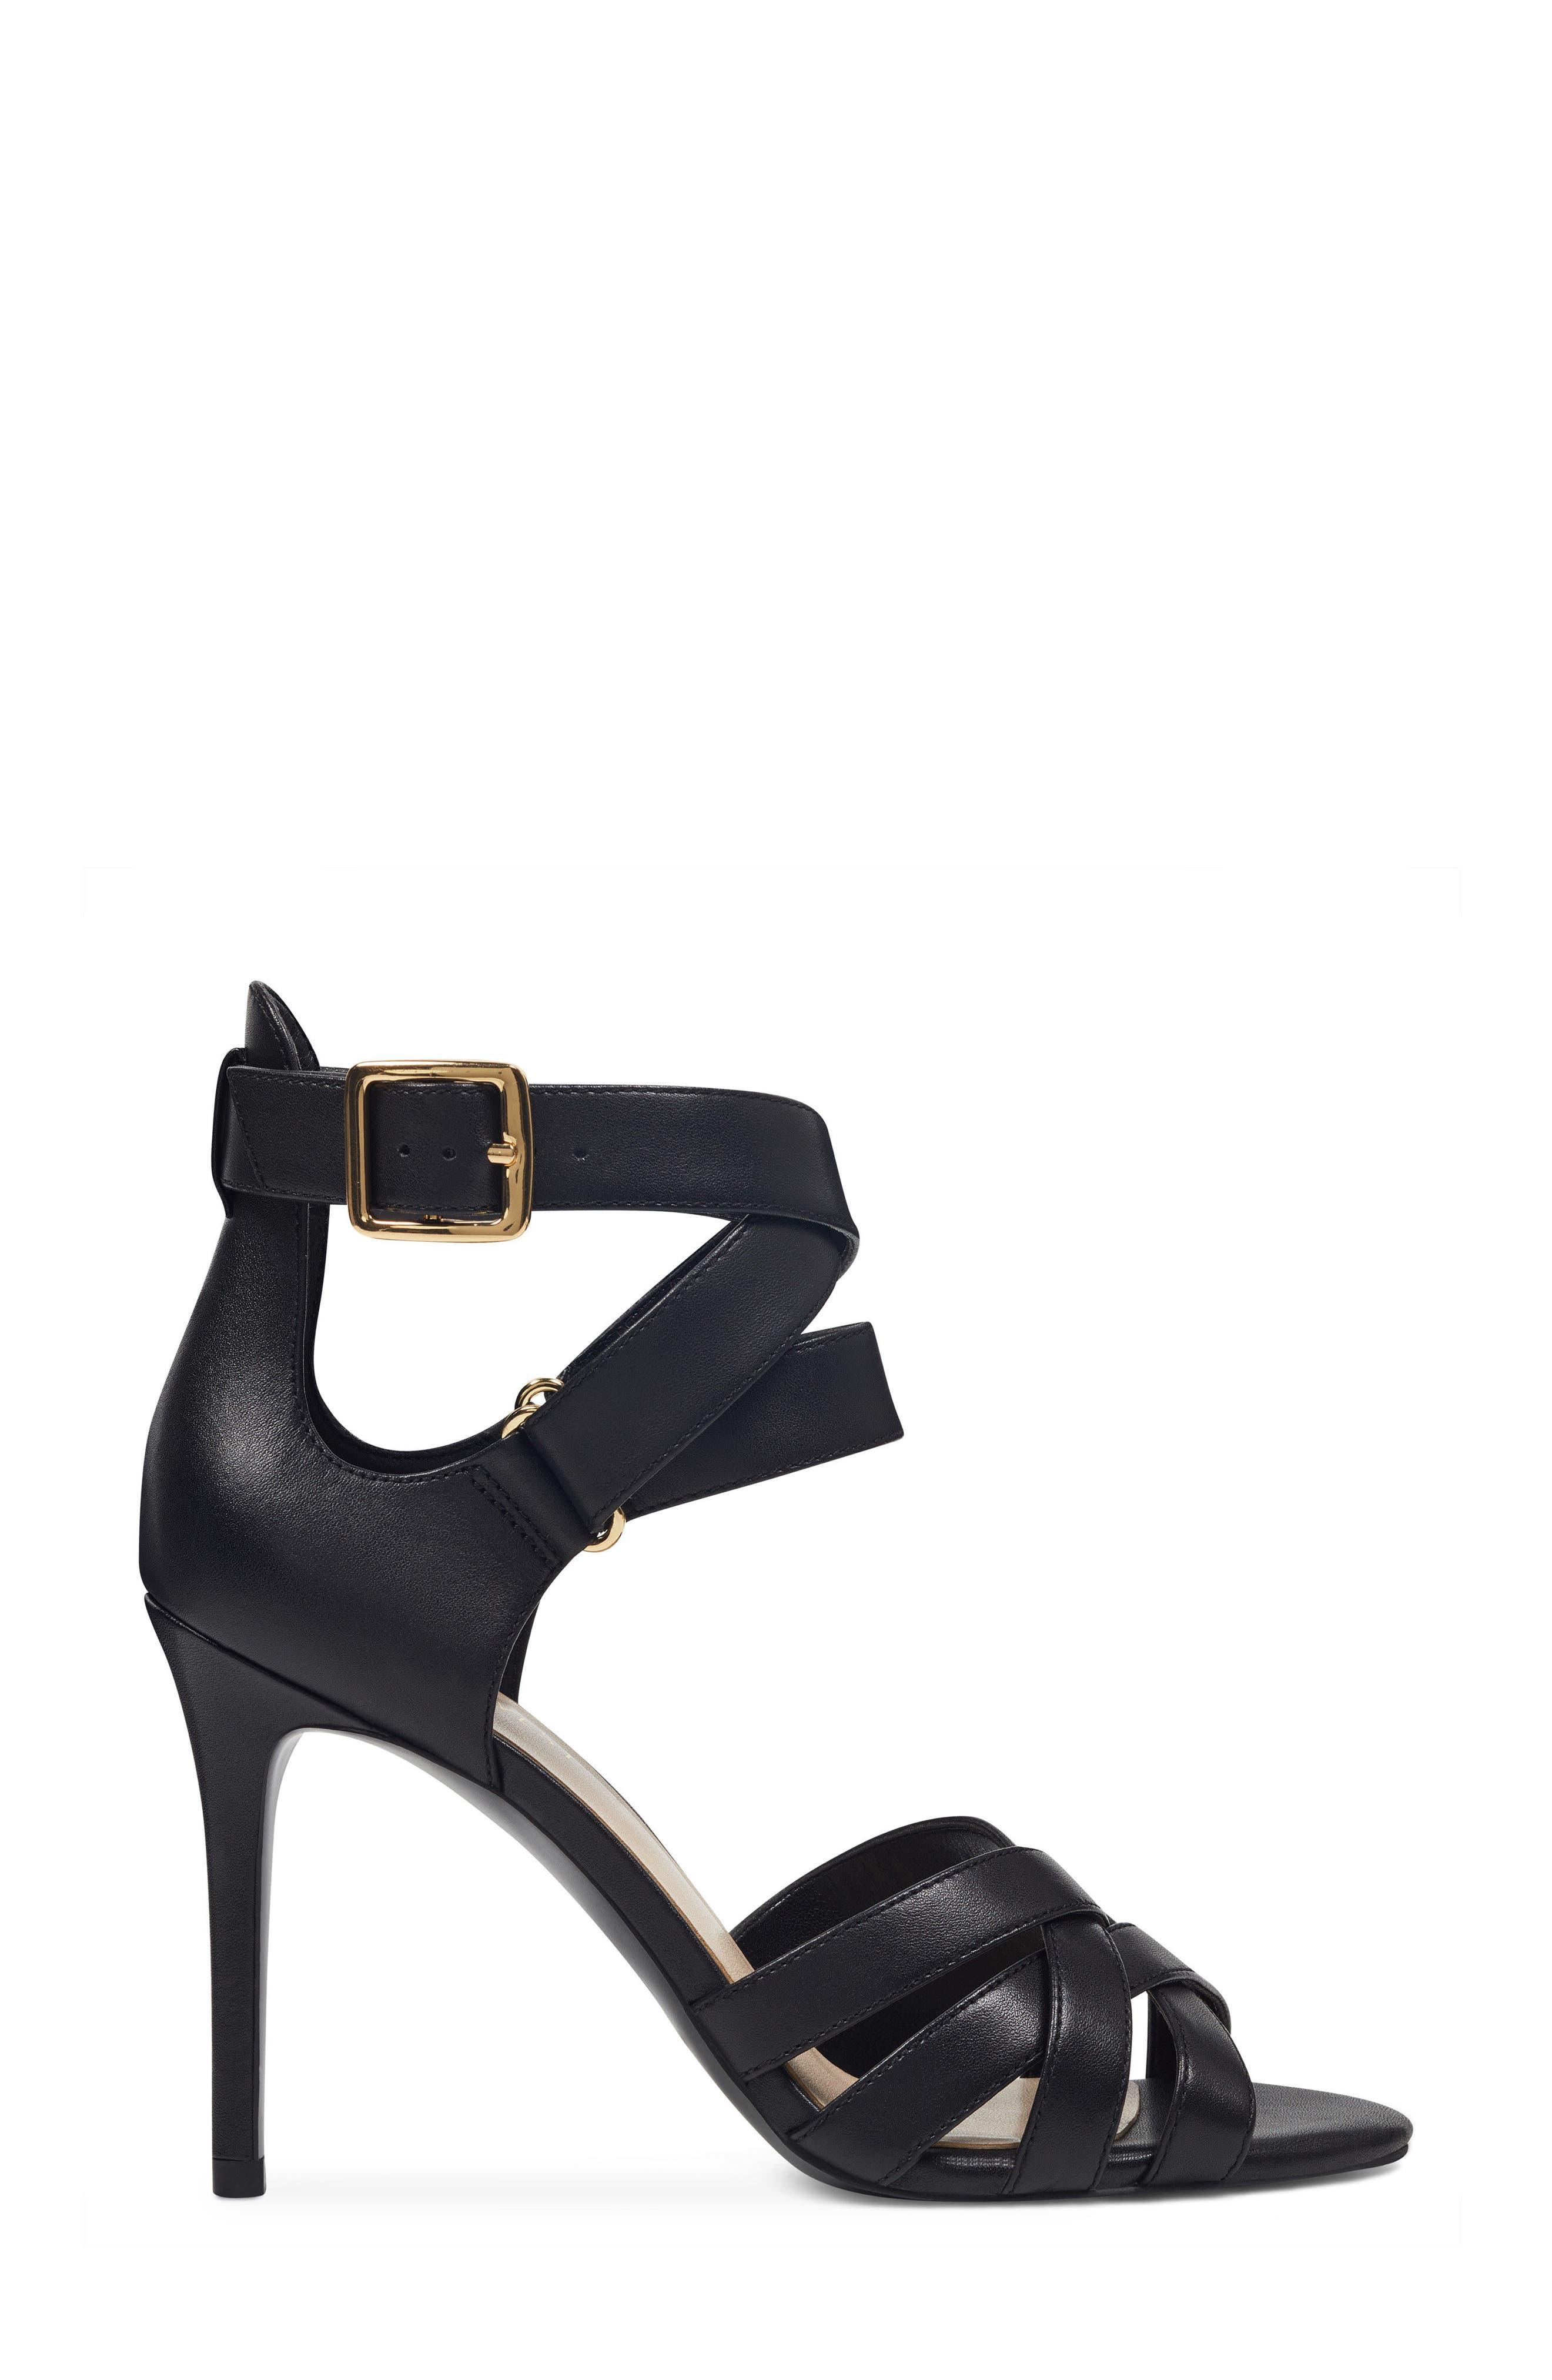 McGlynn Strappy Sandal,                             Alternate thumbnail 3, color,                             Black Leather